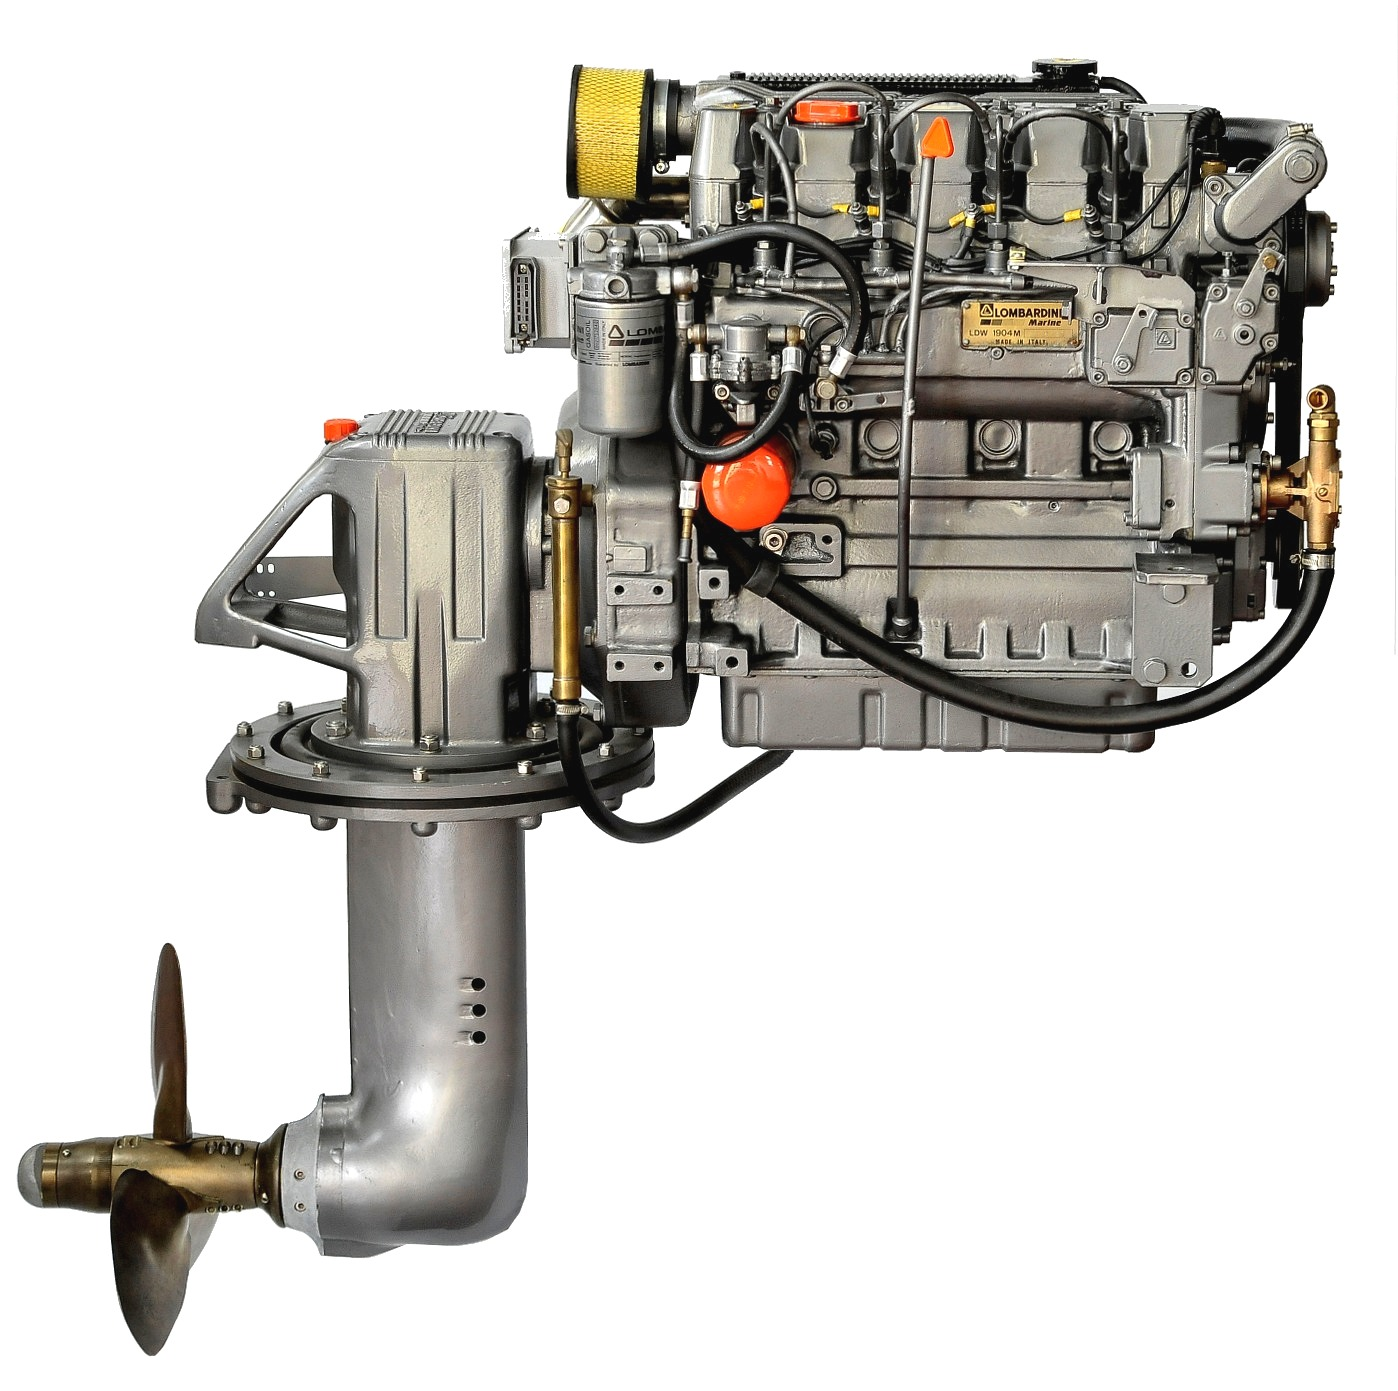 Lombardini LDW2204M, 50 hk dieselmotor med S-drev